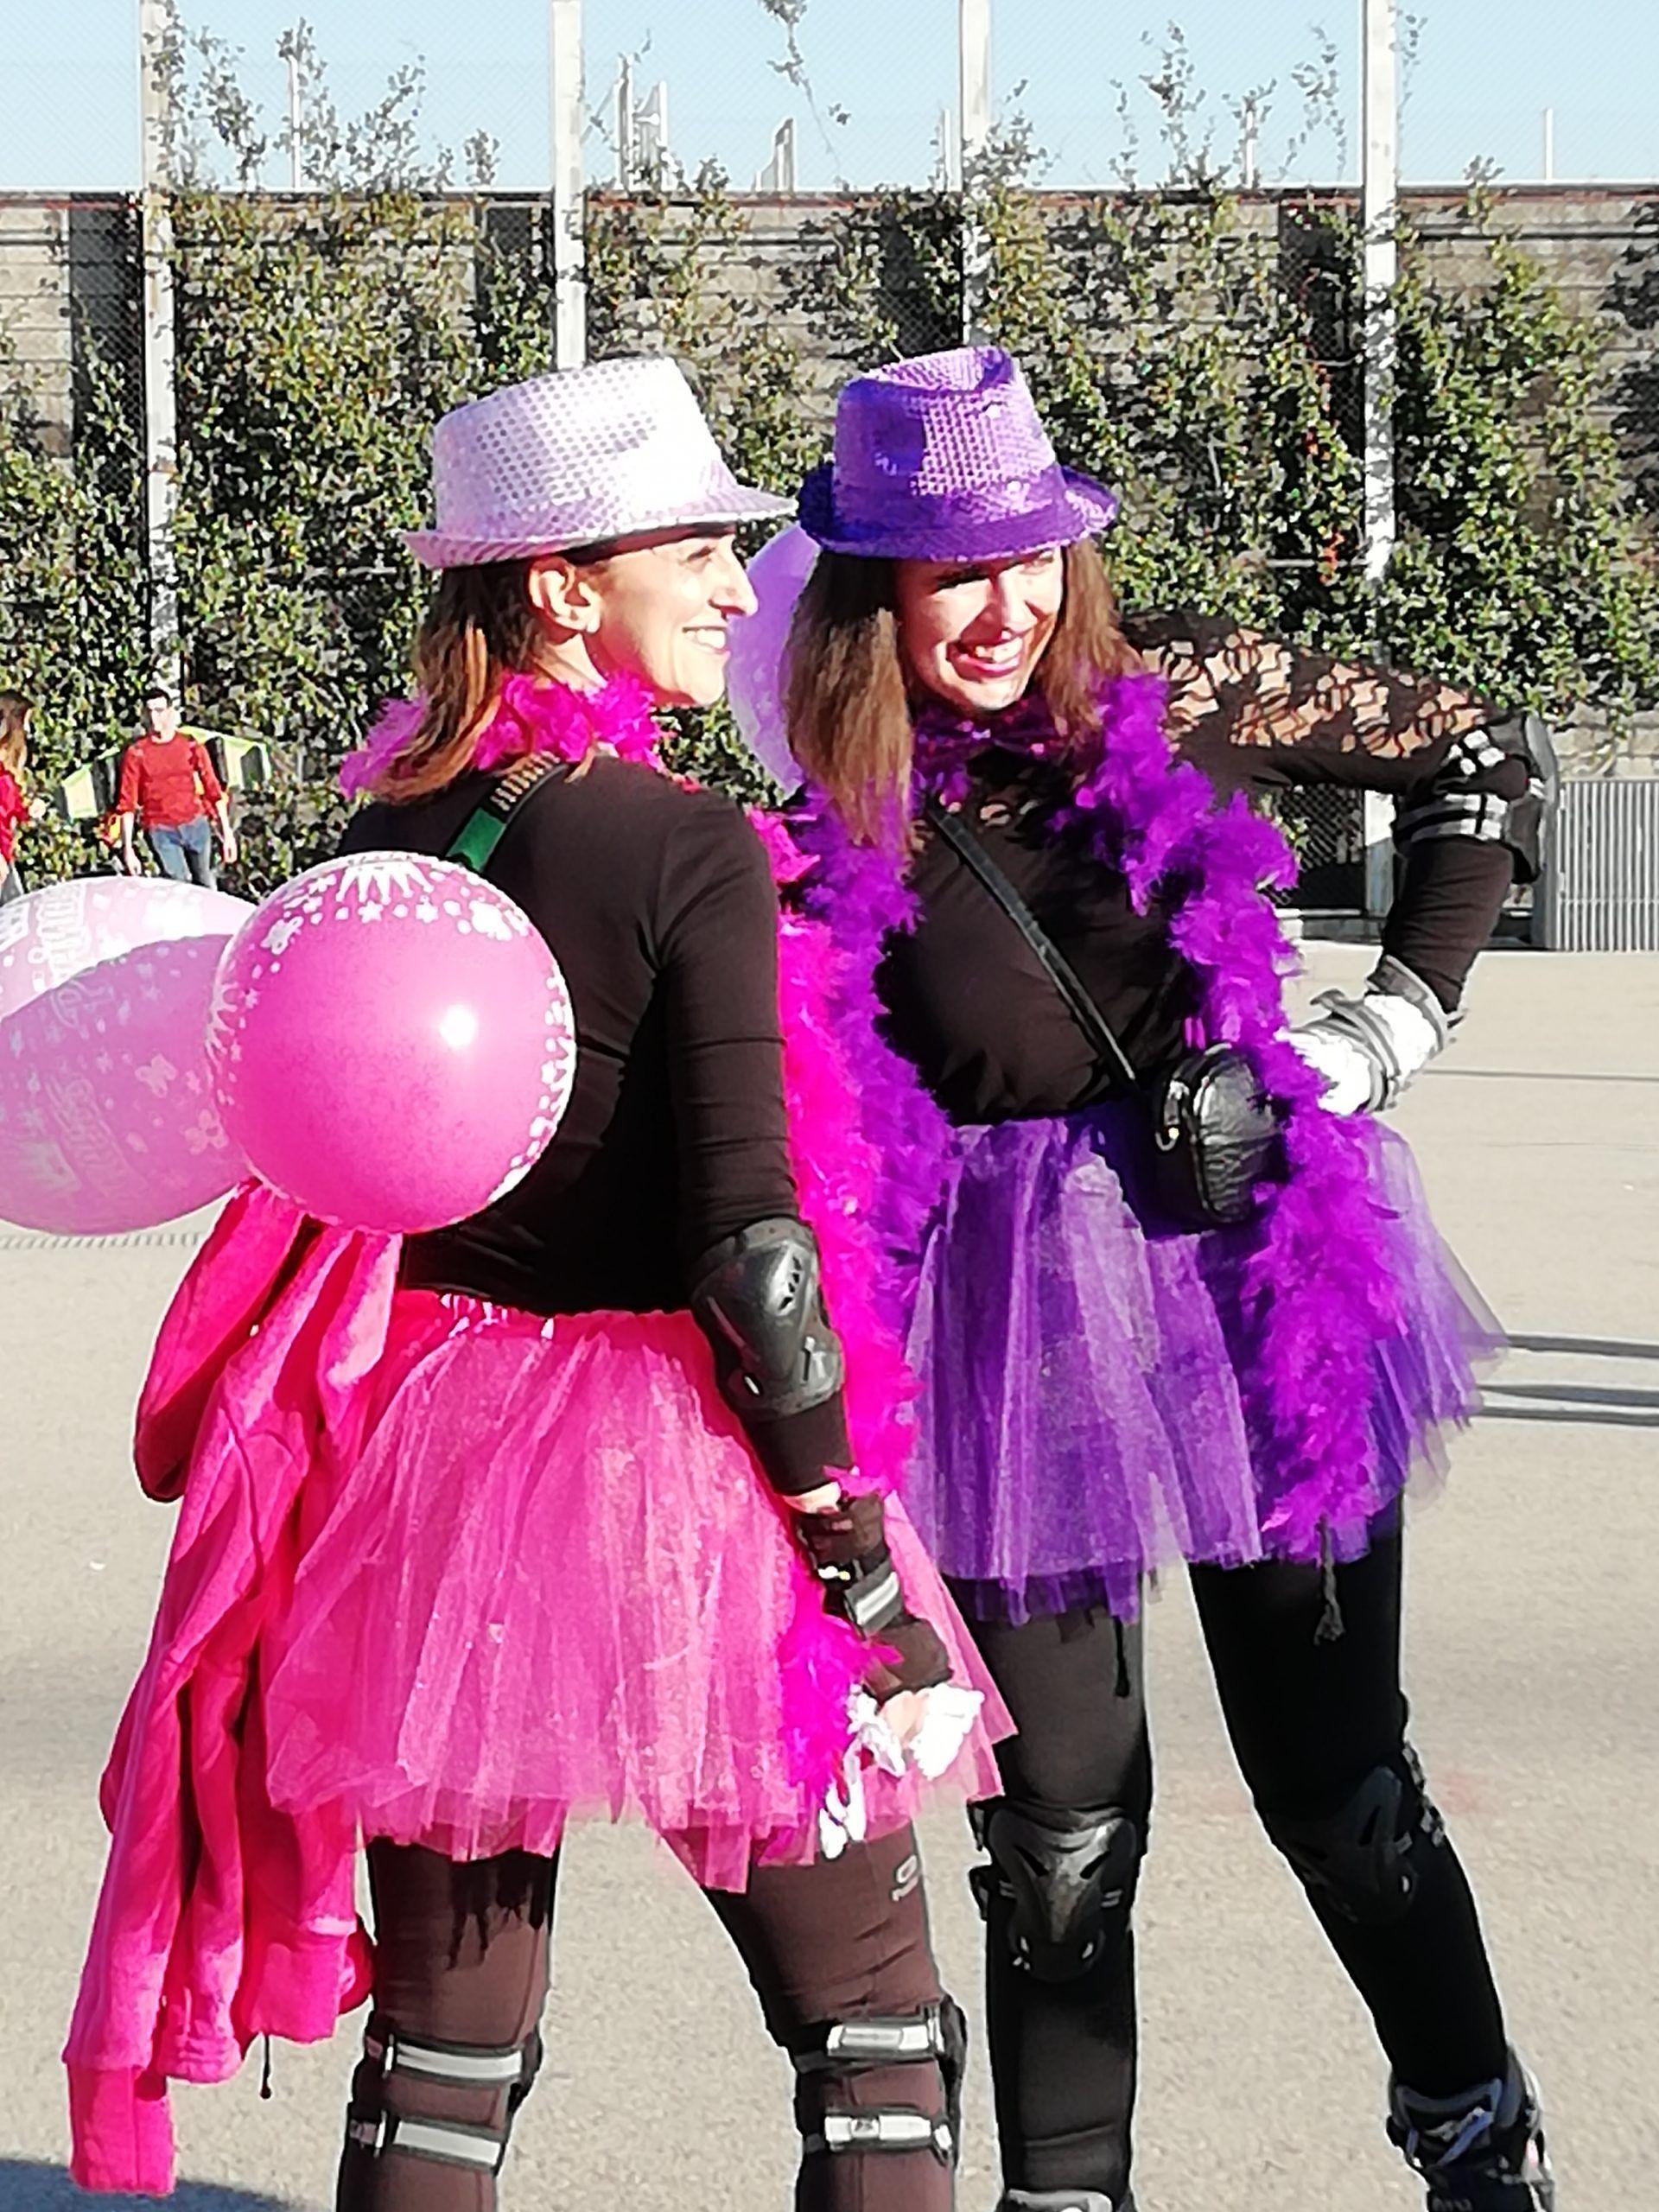 Ruta de Carnaval 2020 en patines